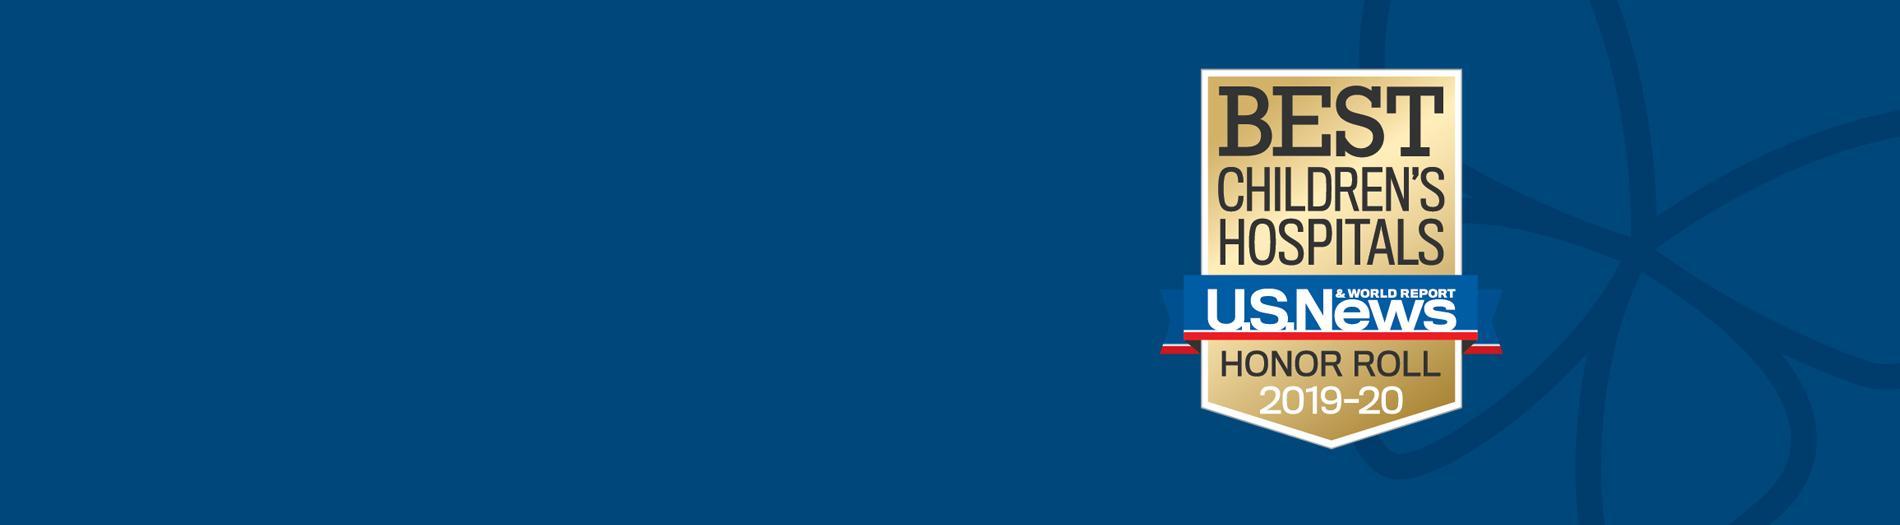 CHLA-Brand-Intermediate-2020-Desktop-Banner-01.jpg